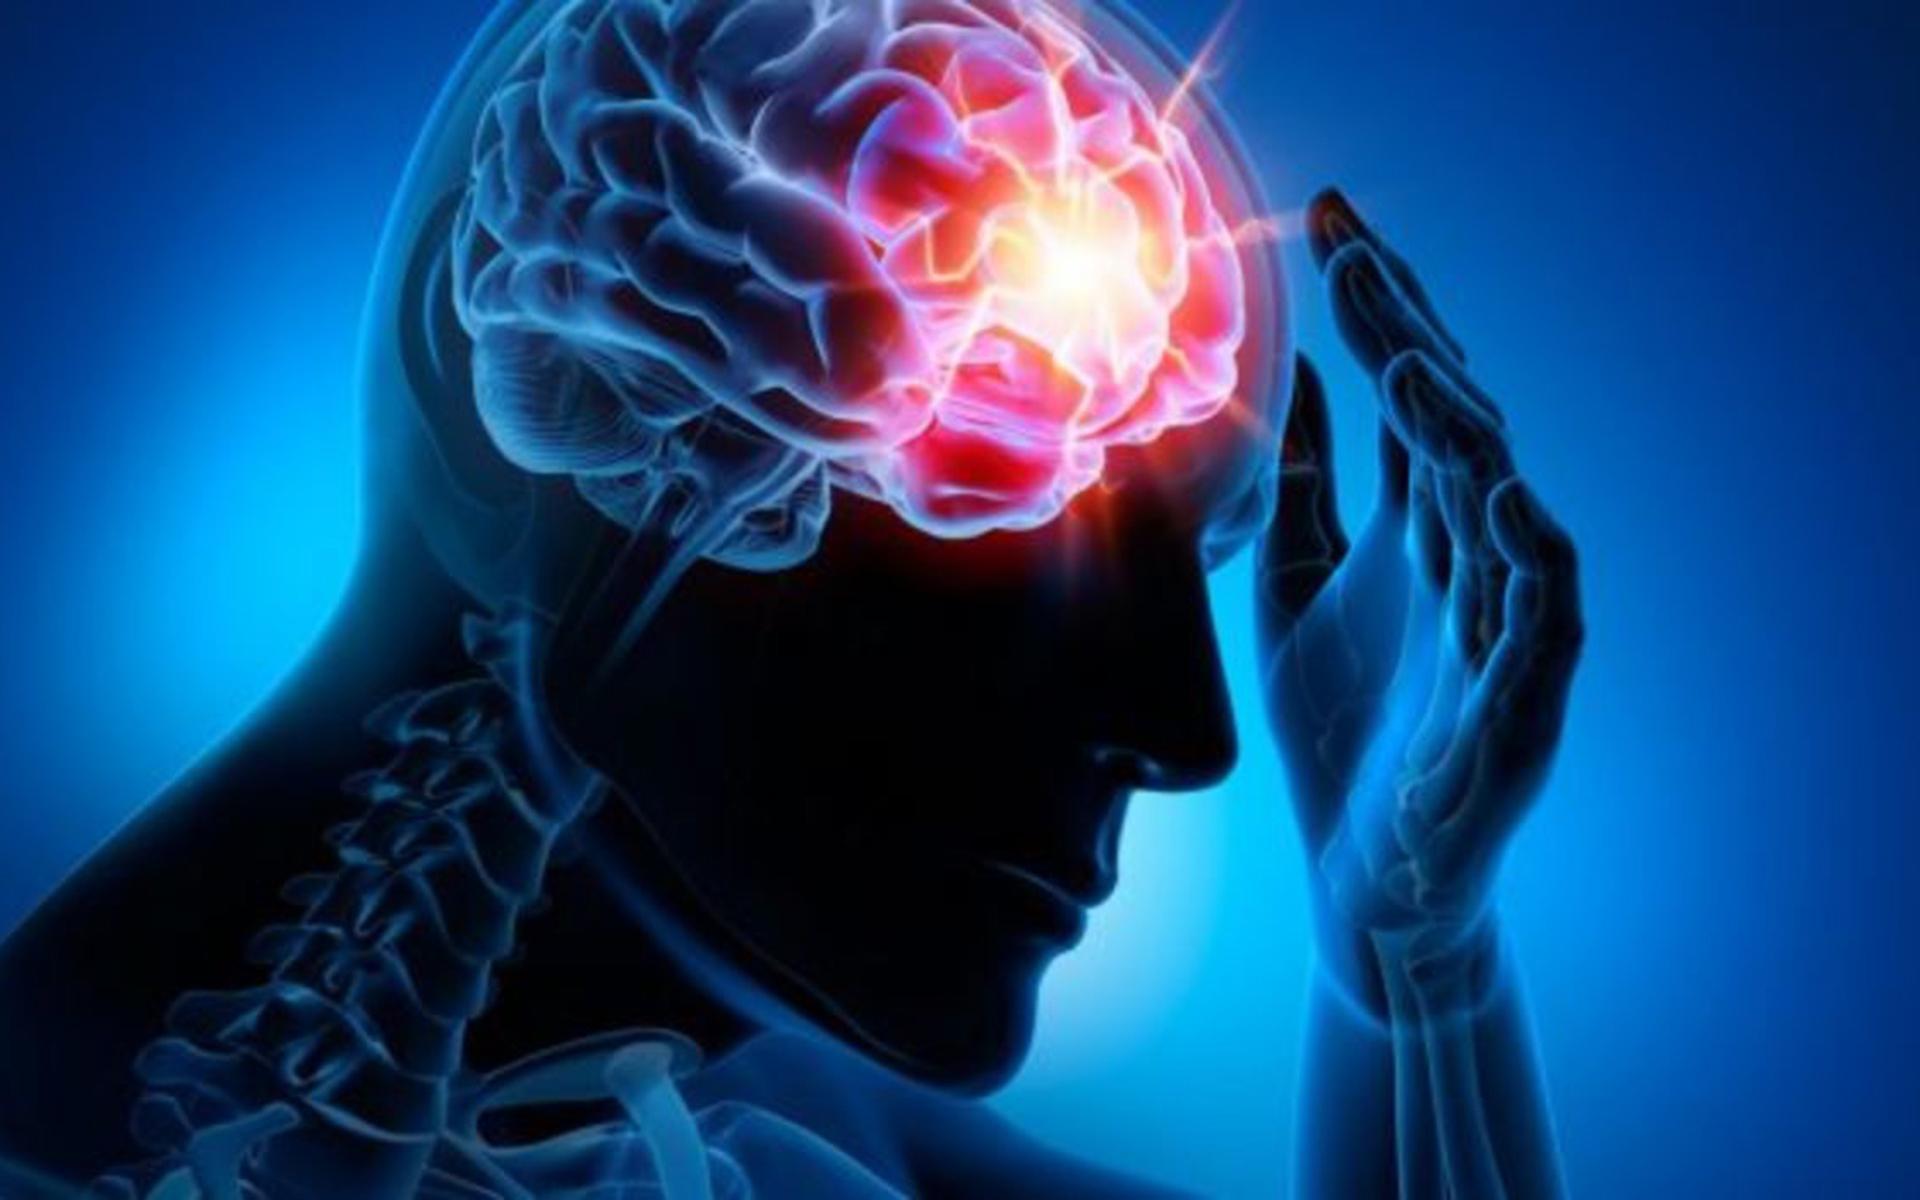 dureri de umăr cu accident vascular cerebral